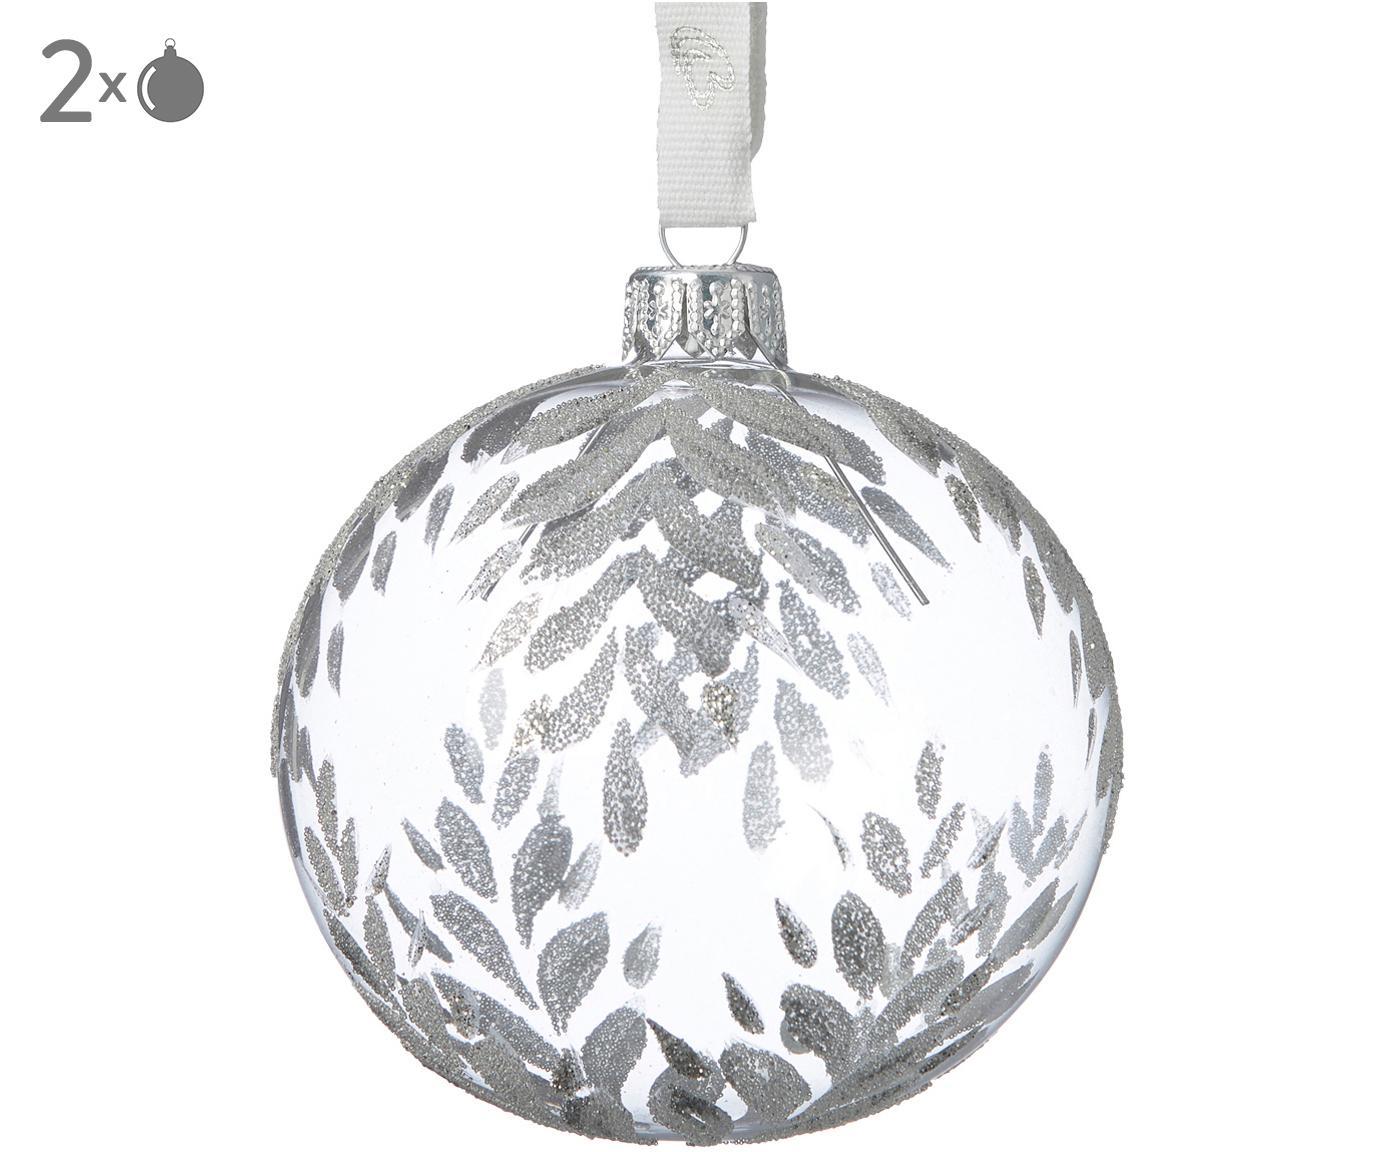 Bolas de Navidad Cadelia, 2uds., Transparente, plateado, Ø 8 x Al 8 cm